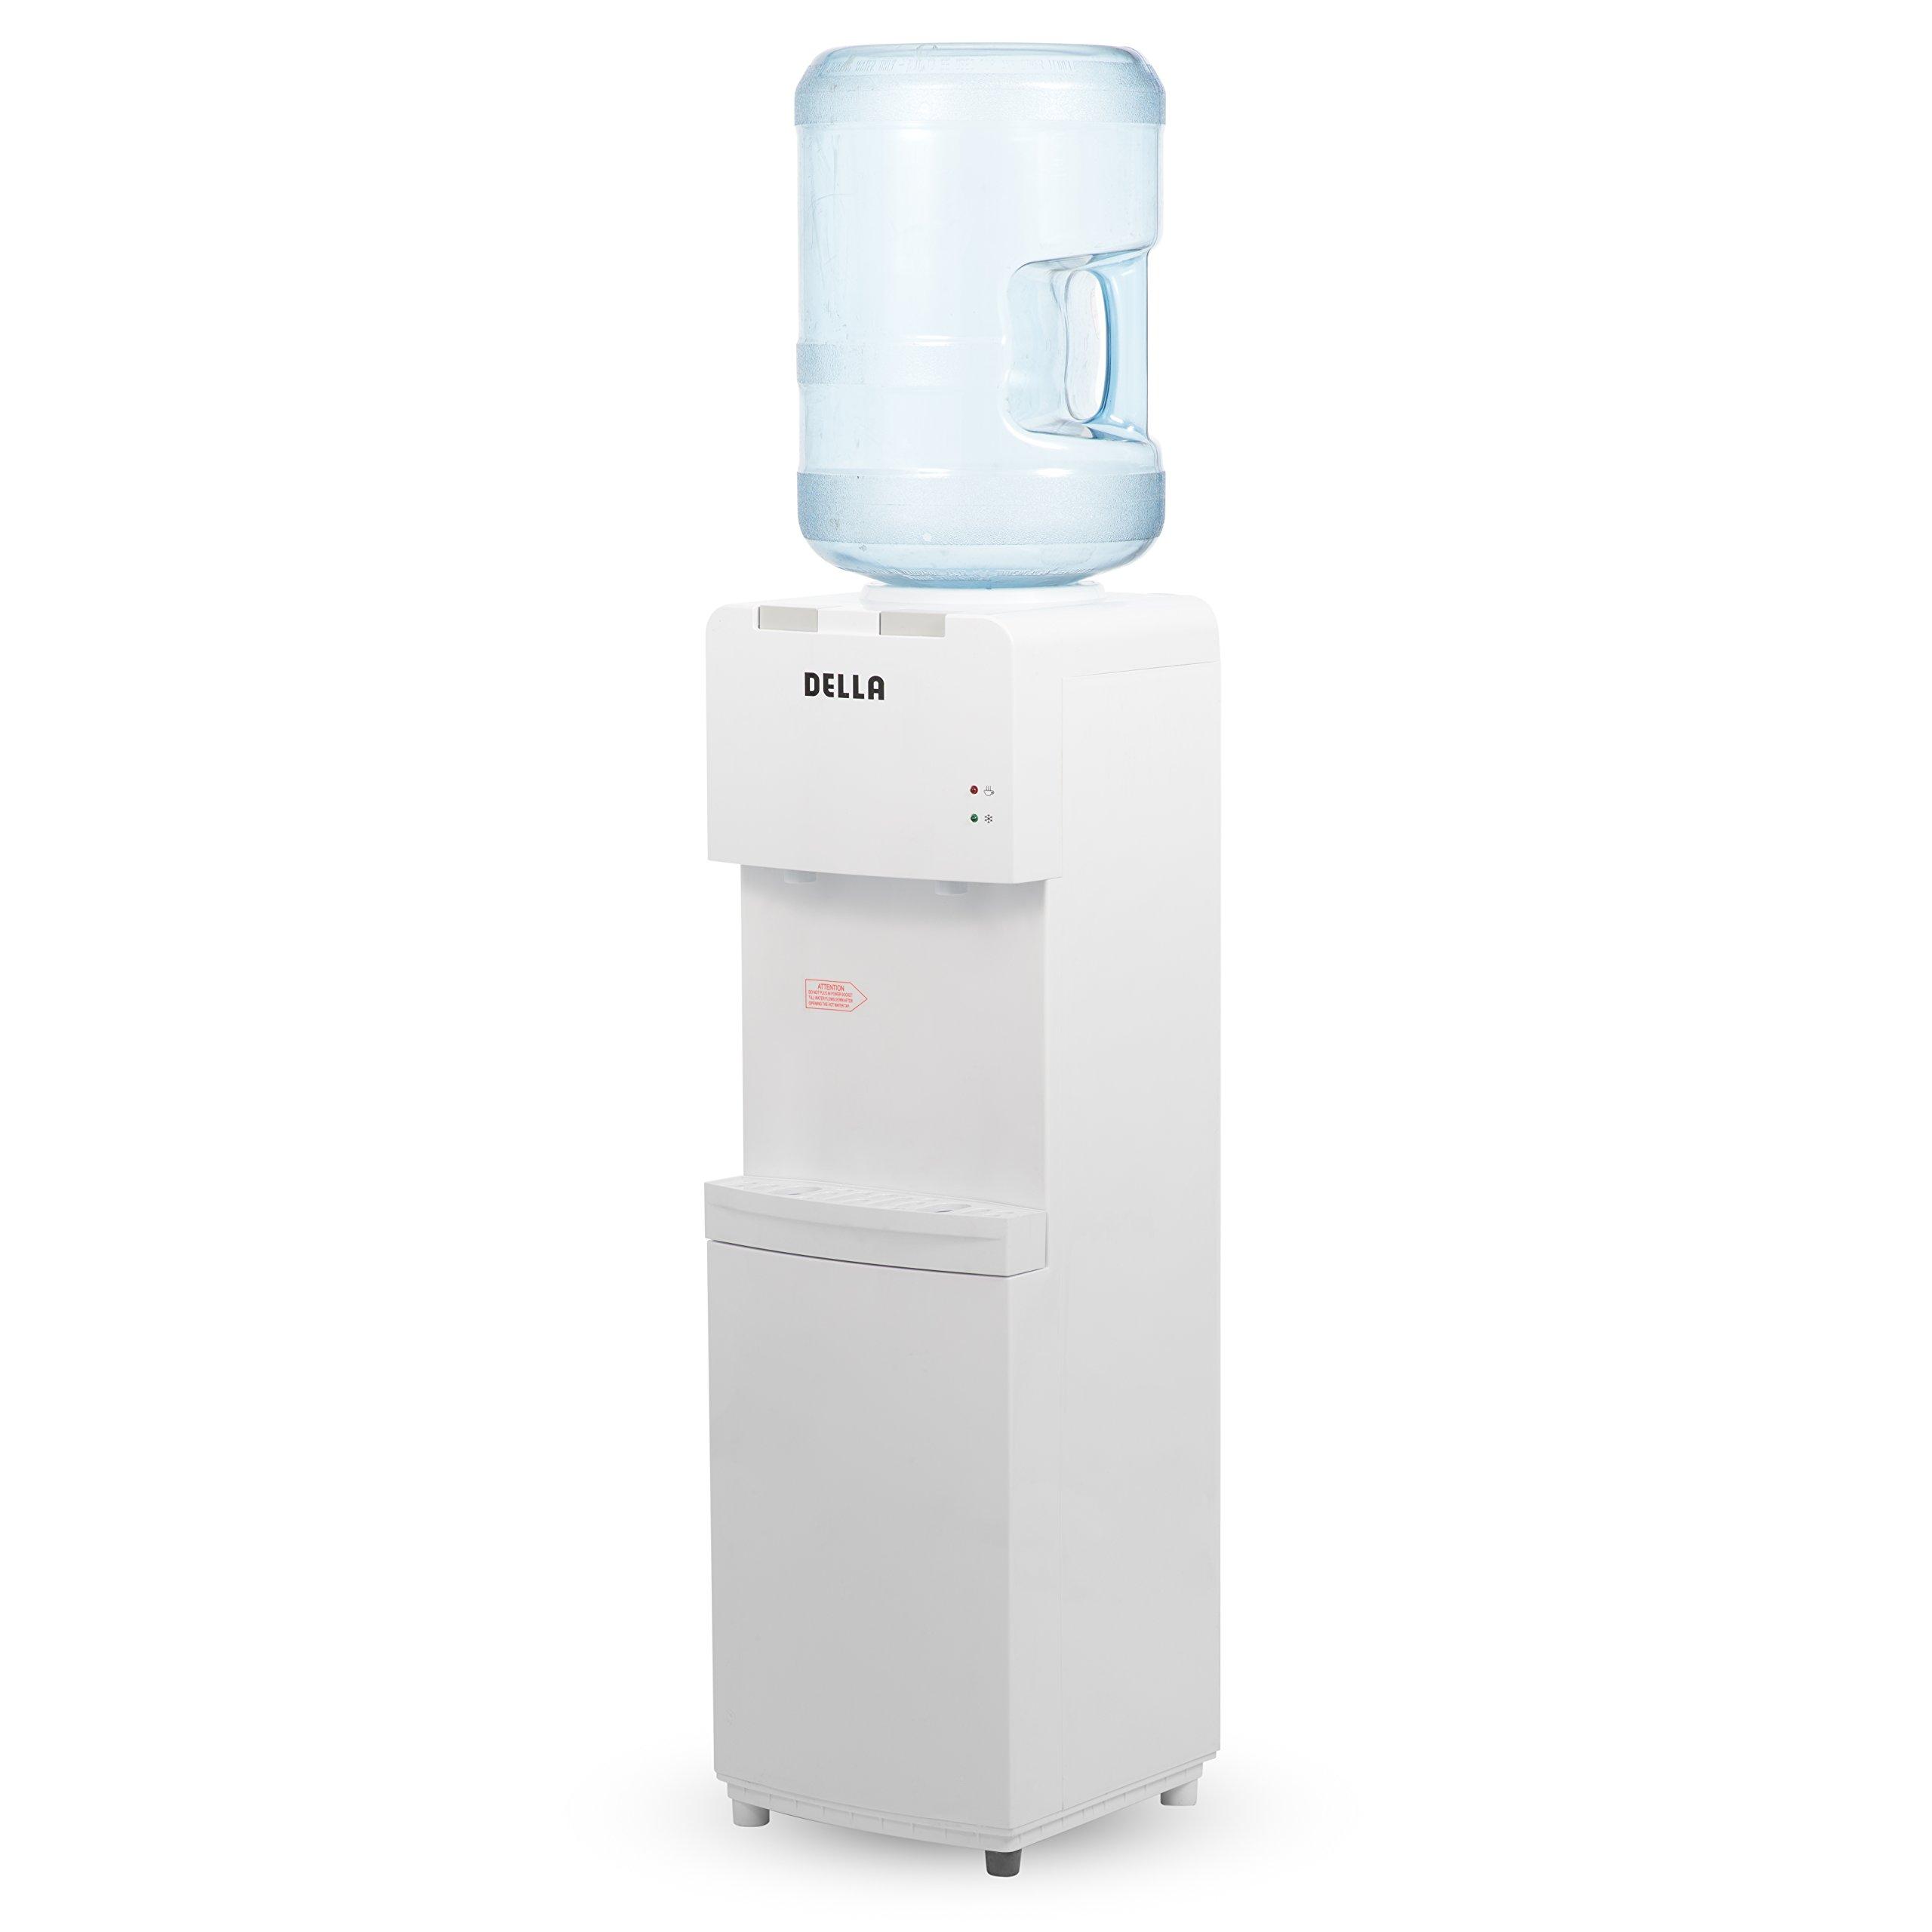 Della Freestanding Water Dispenser Water Cooler Hot Cold Temperature Push Button Child Safety Lock, White